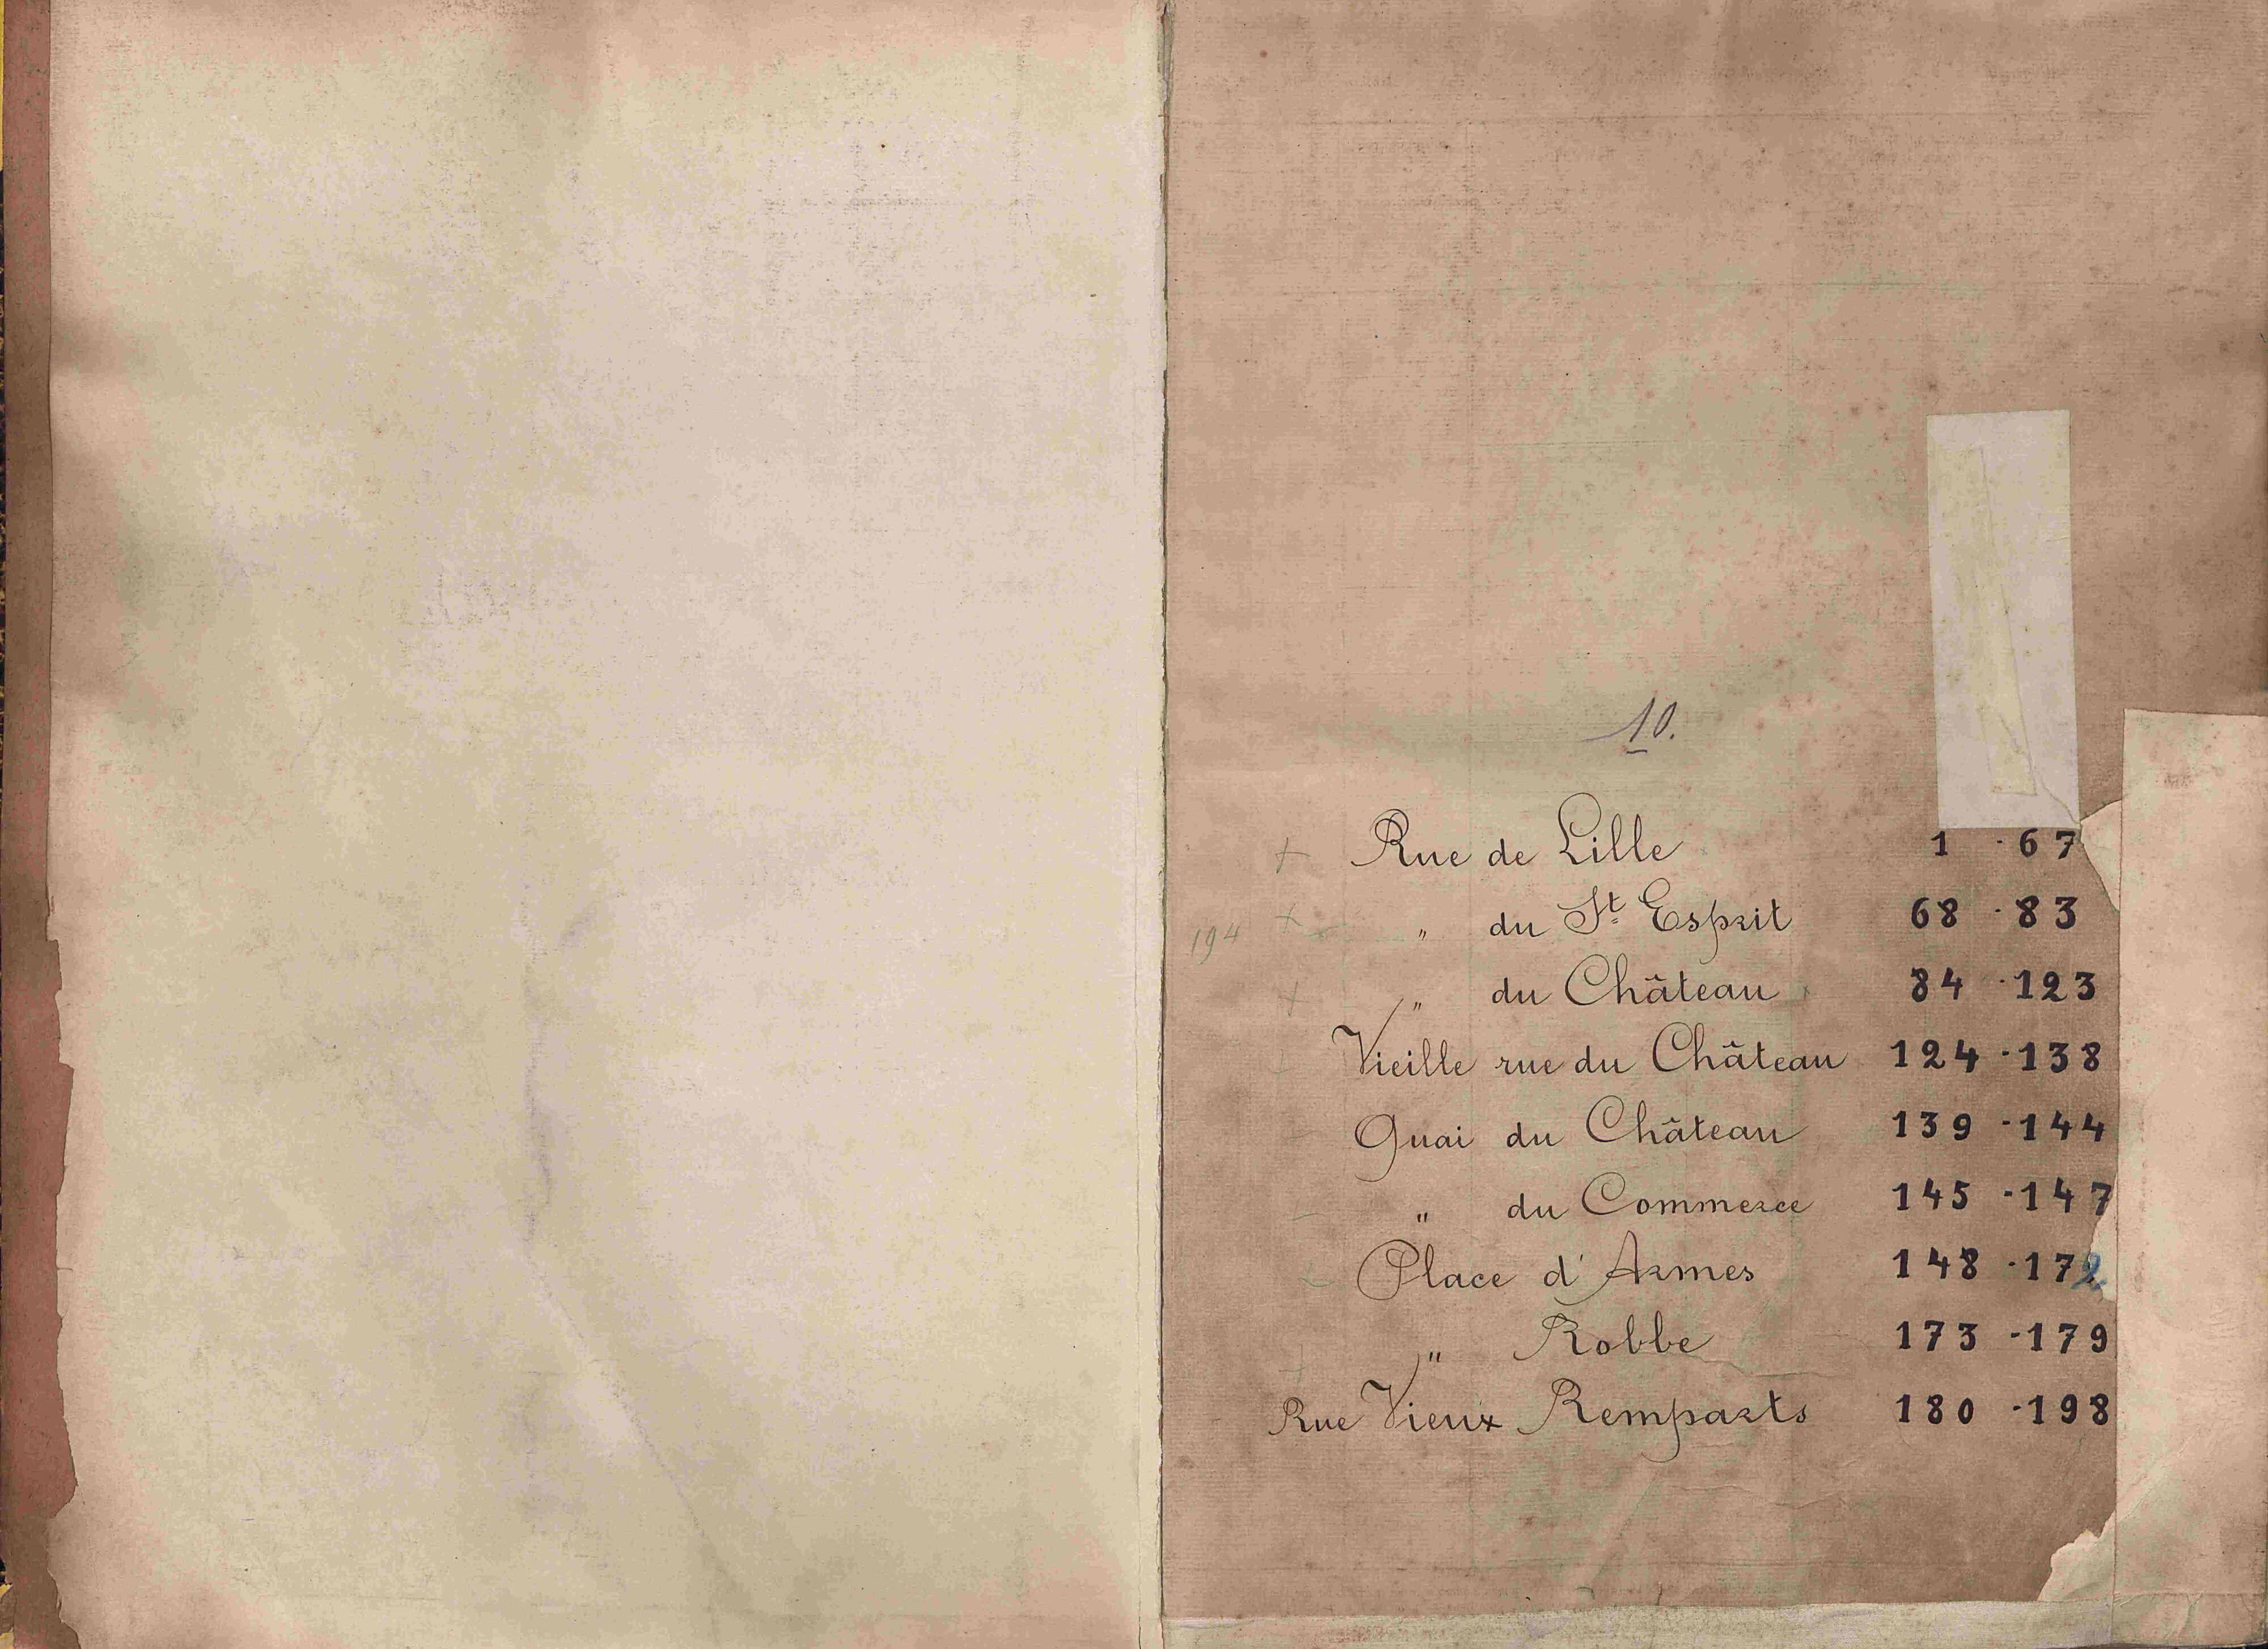 Bevolkingsregister Kortrijk 1890 boek 10